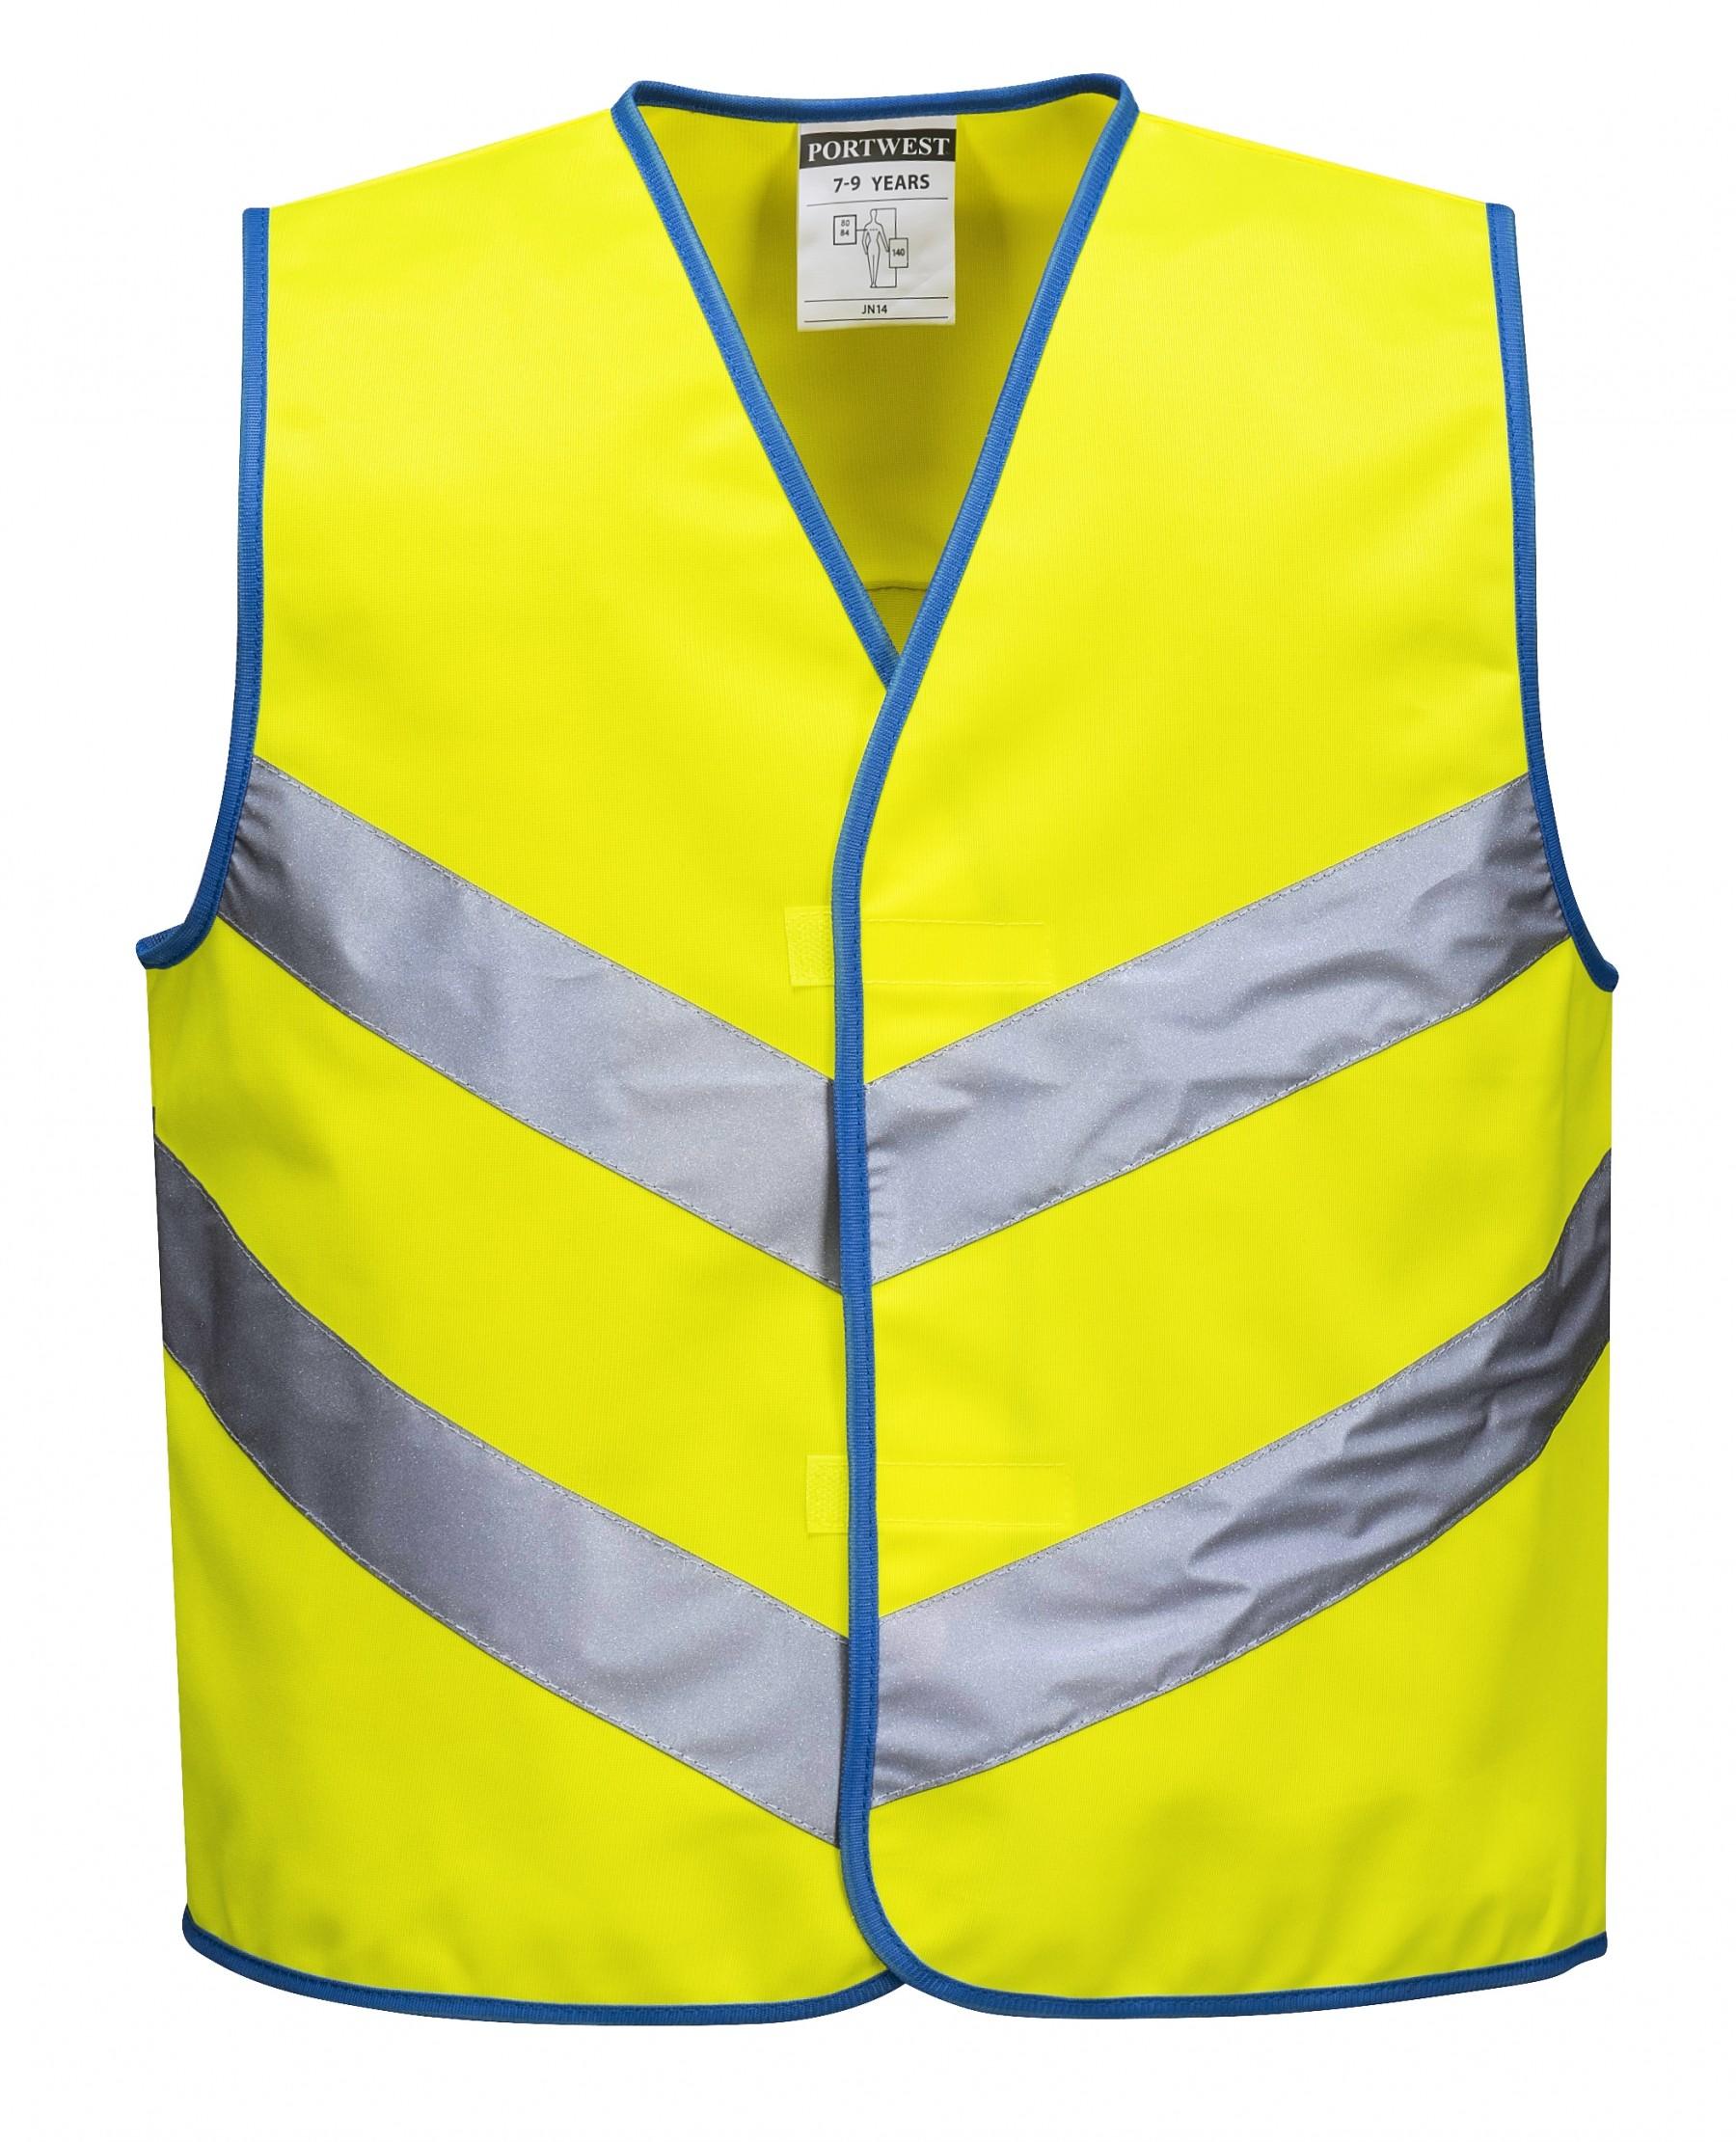 Portwest Junior Colour Bright Vest - JN15